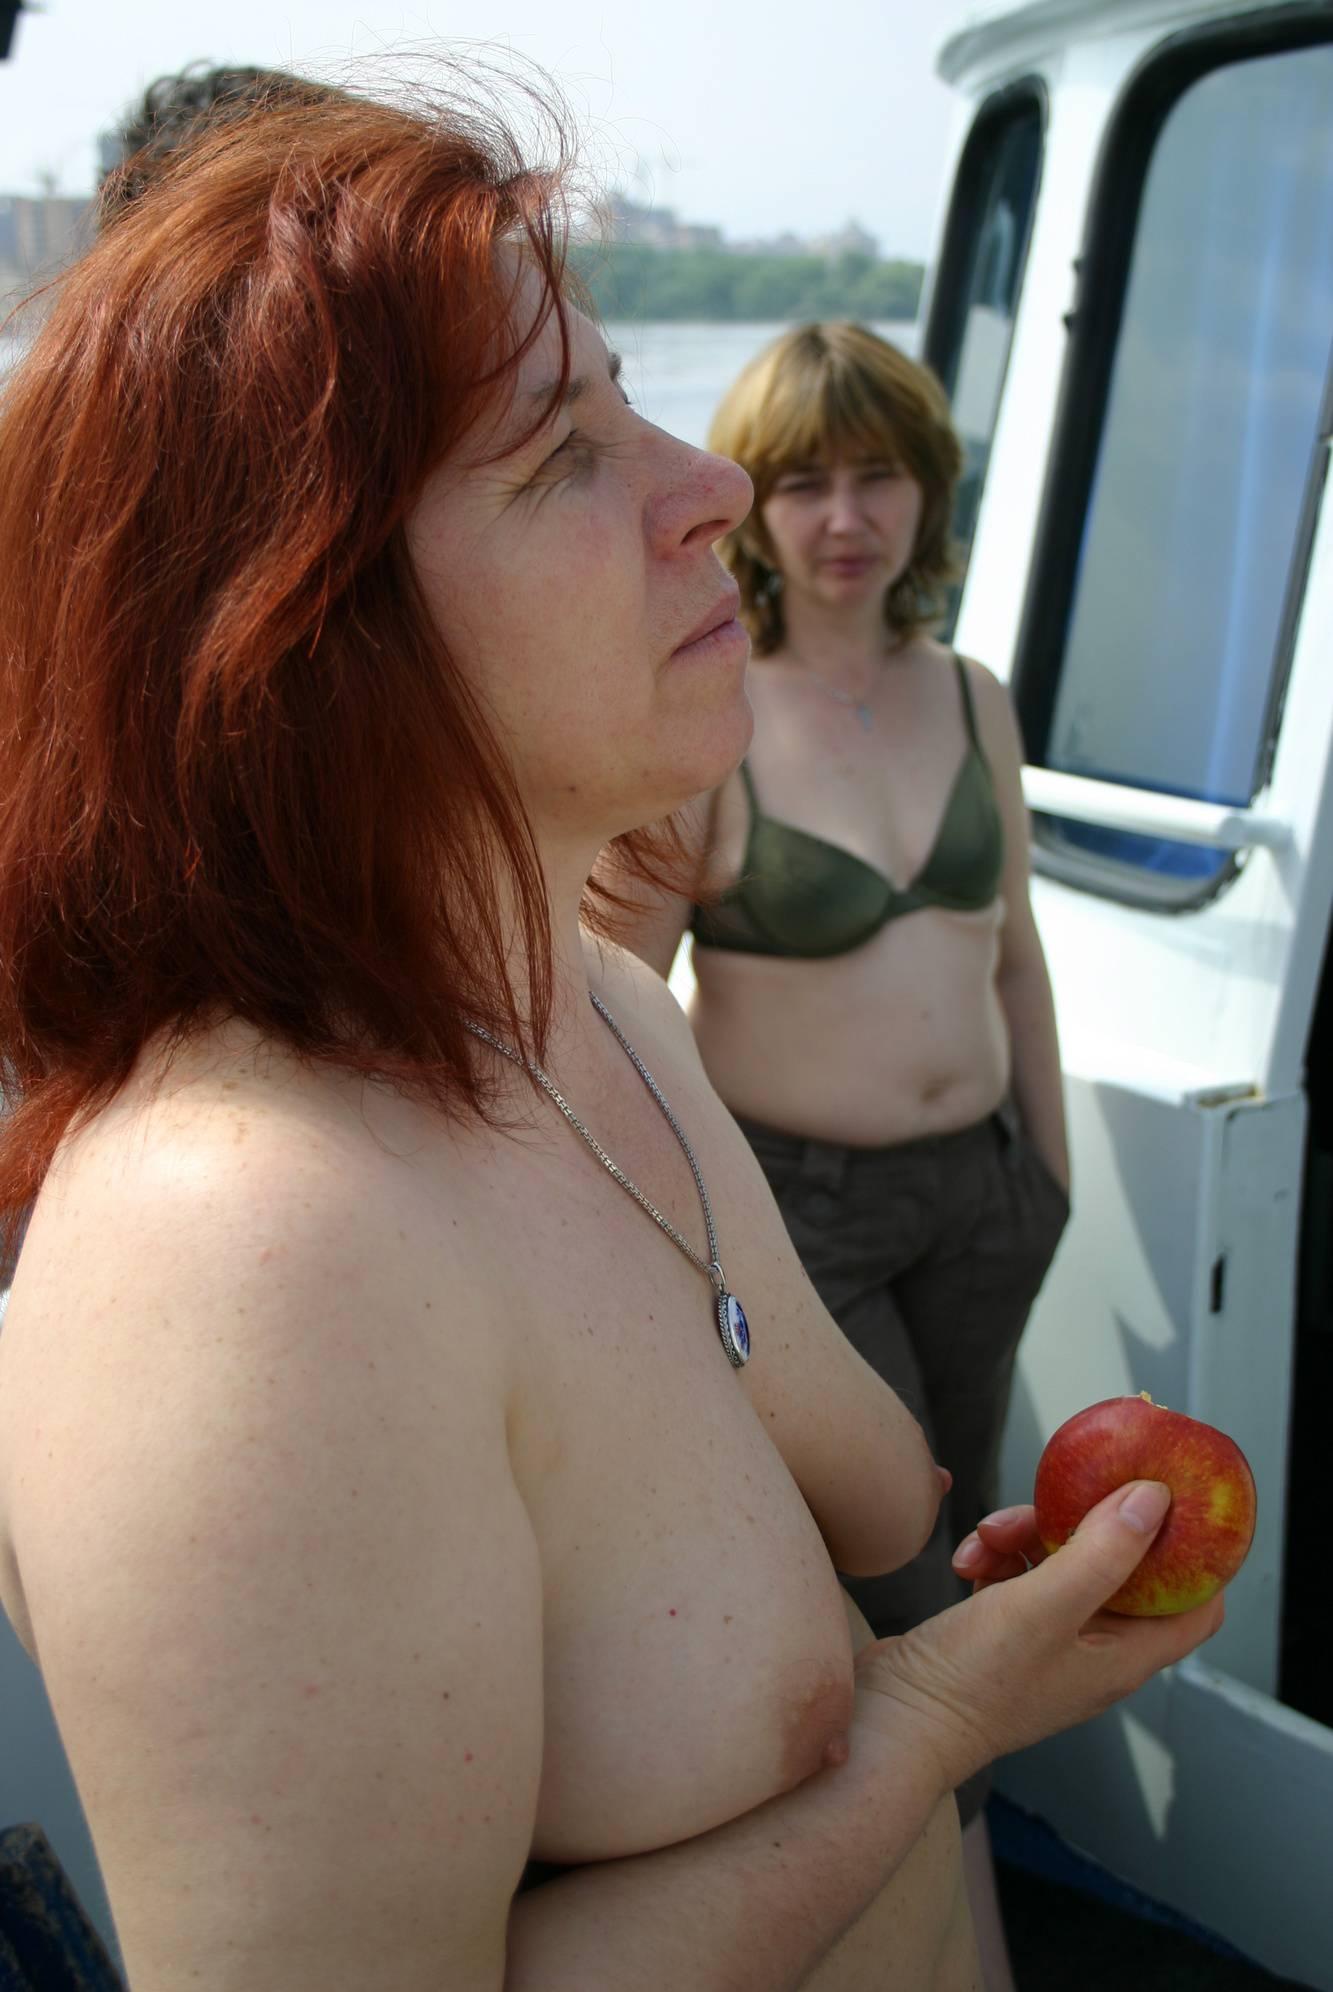 Nudist Pictures Kiev Sailing Ship Family - 1